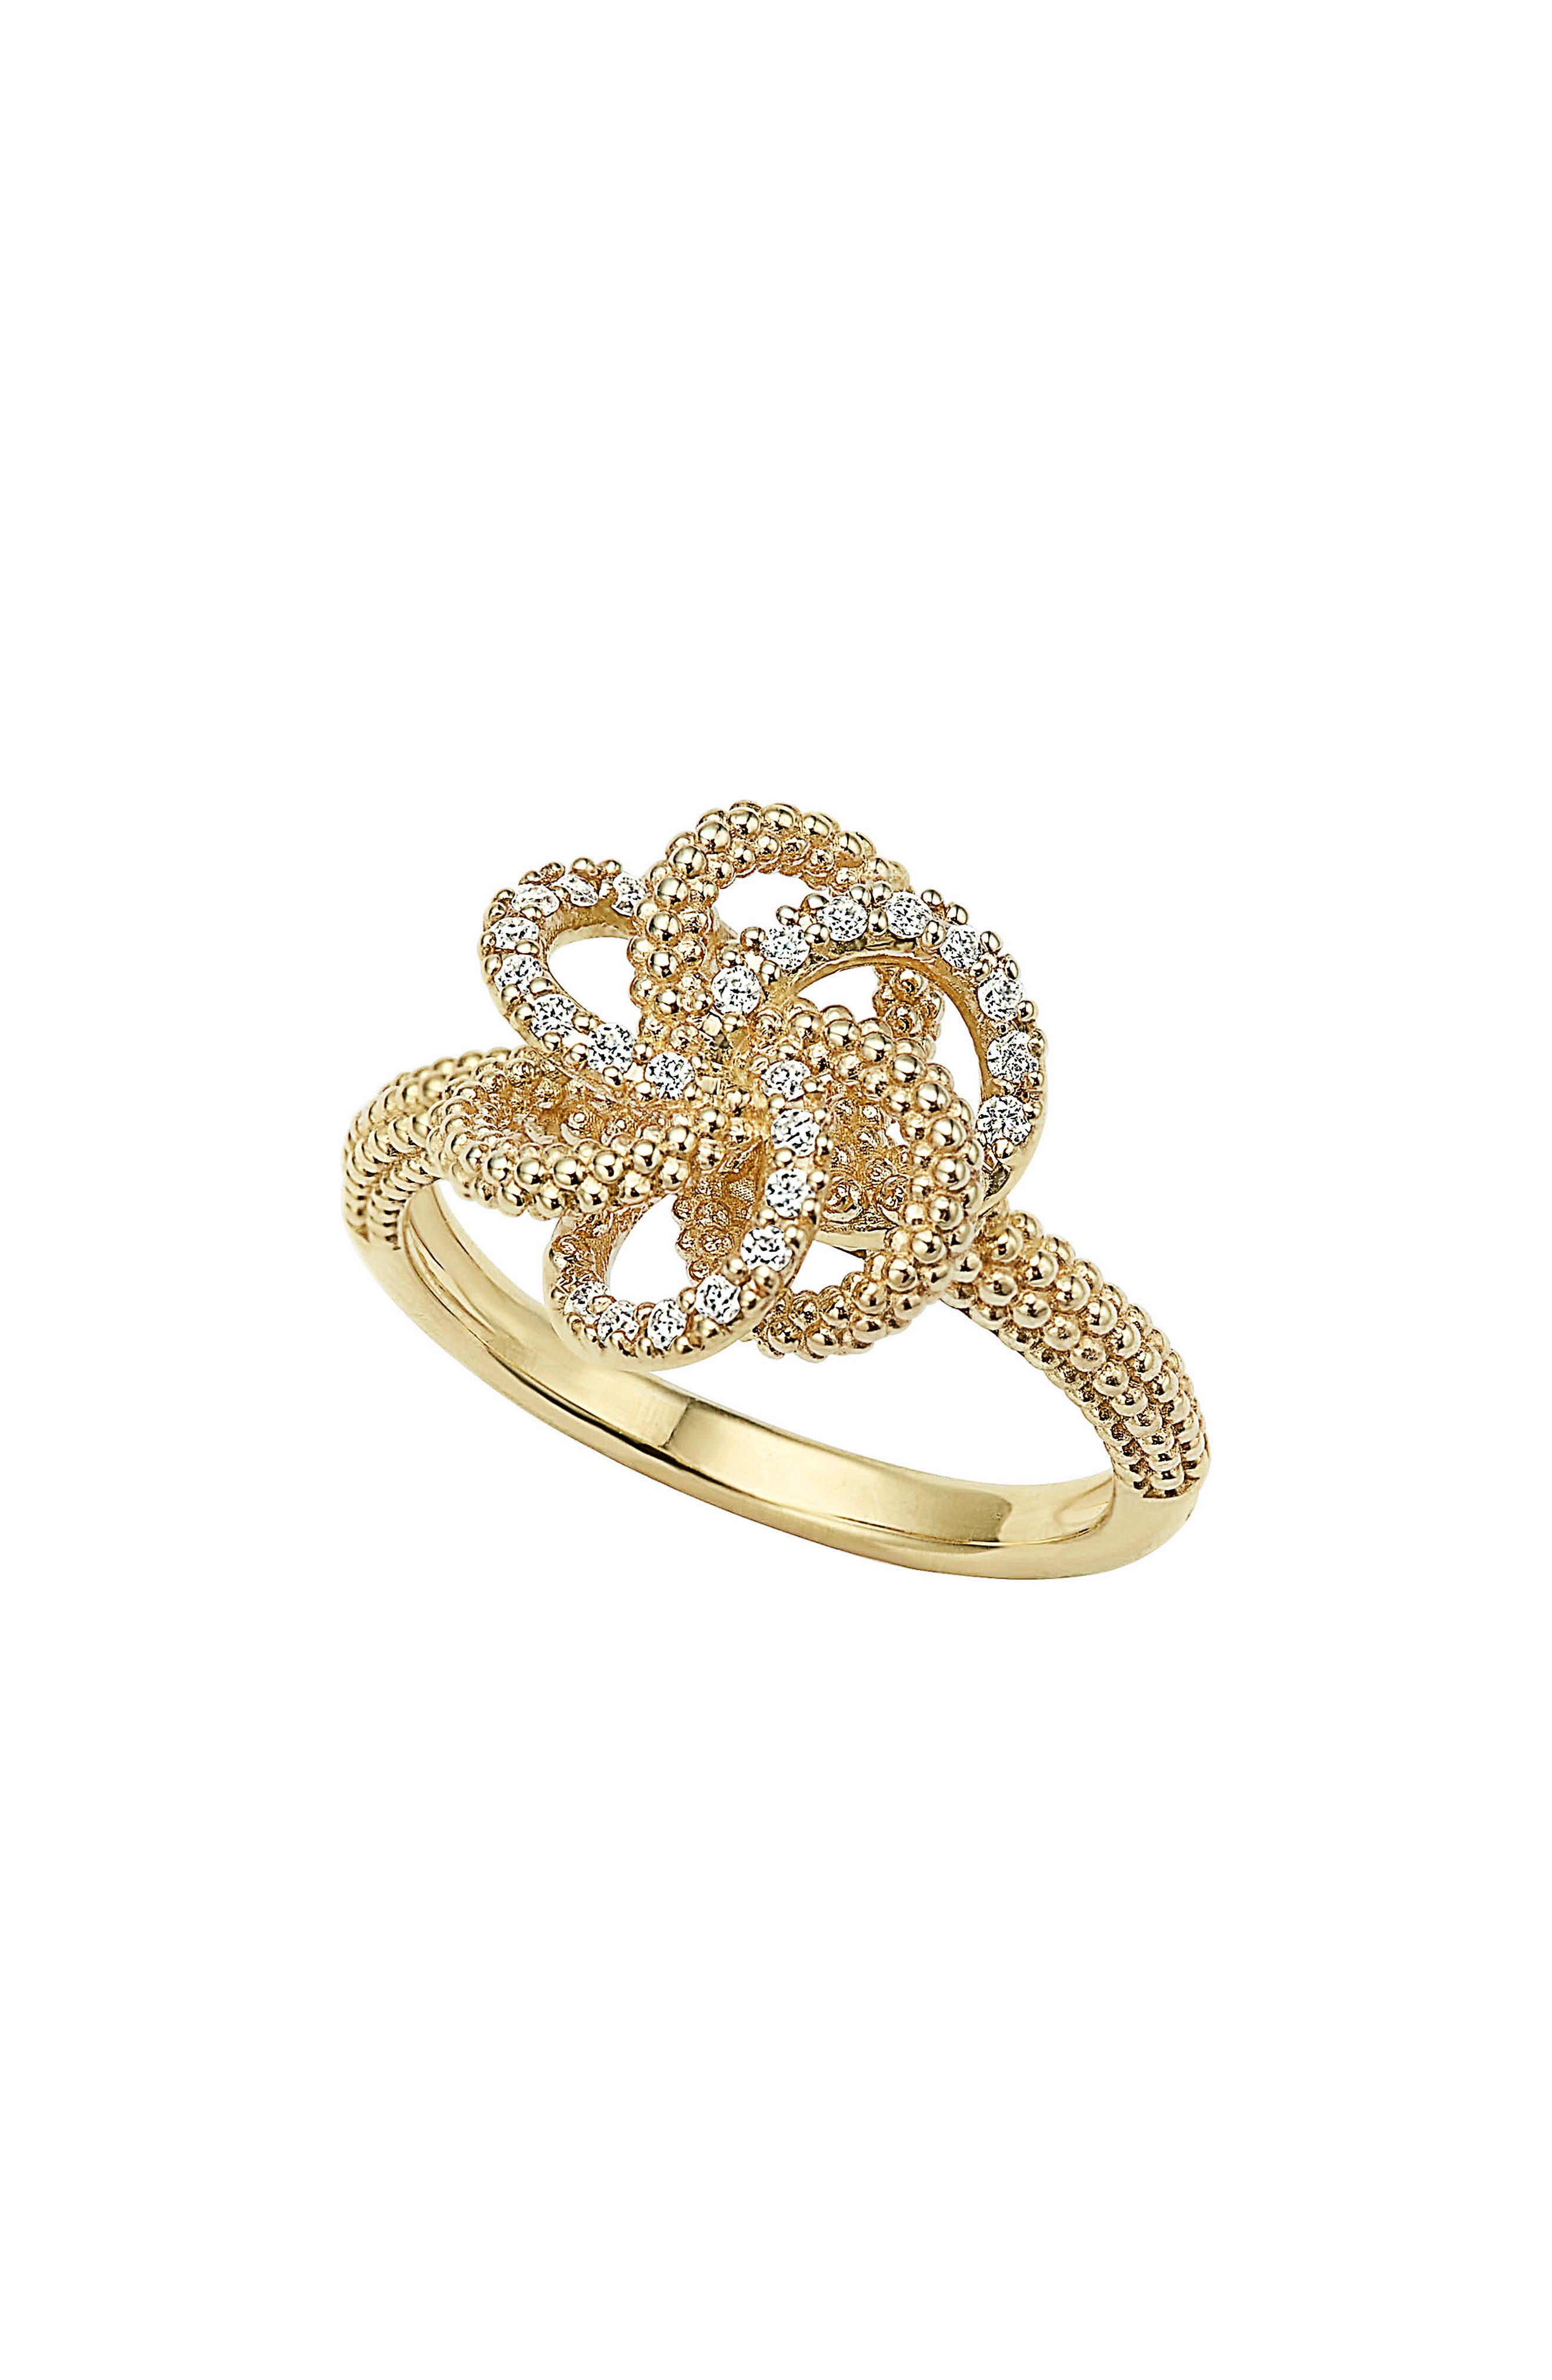 'Love Knot' Diamond Ring,                             Main thumbnail 1, color,                             GOLD